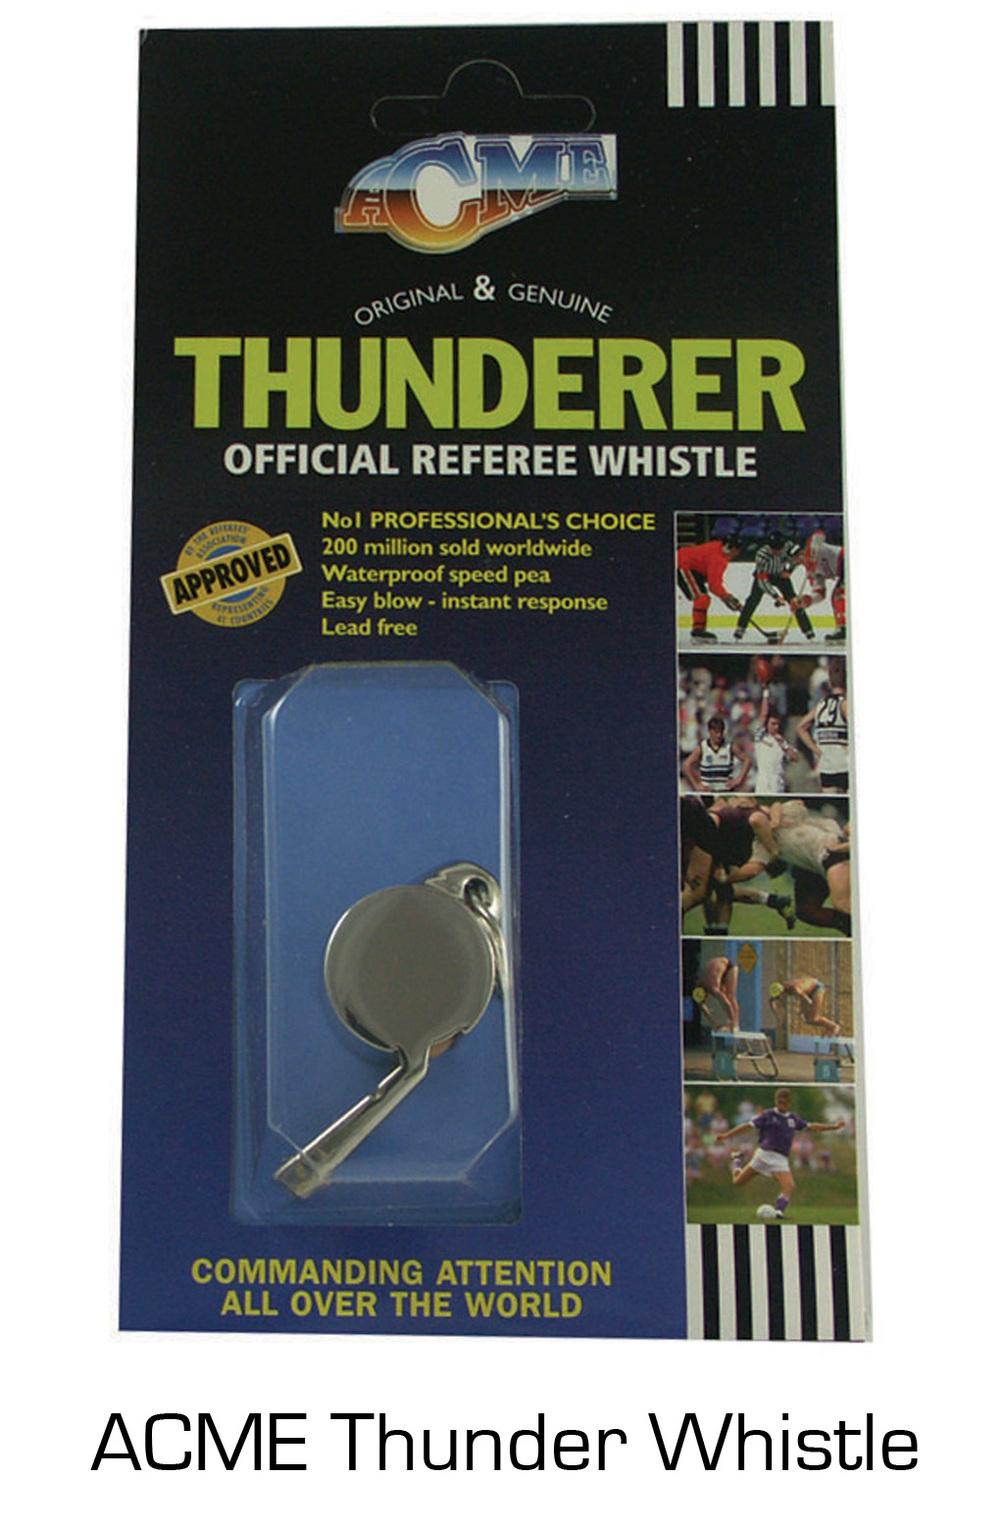 ACME Thunder Whistle